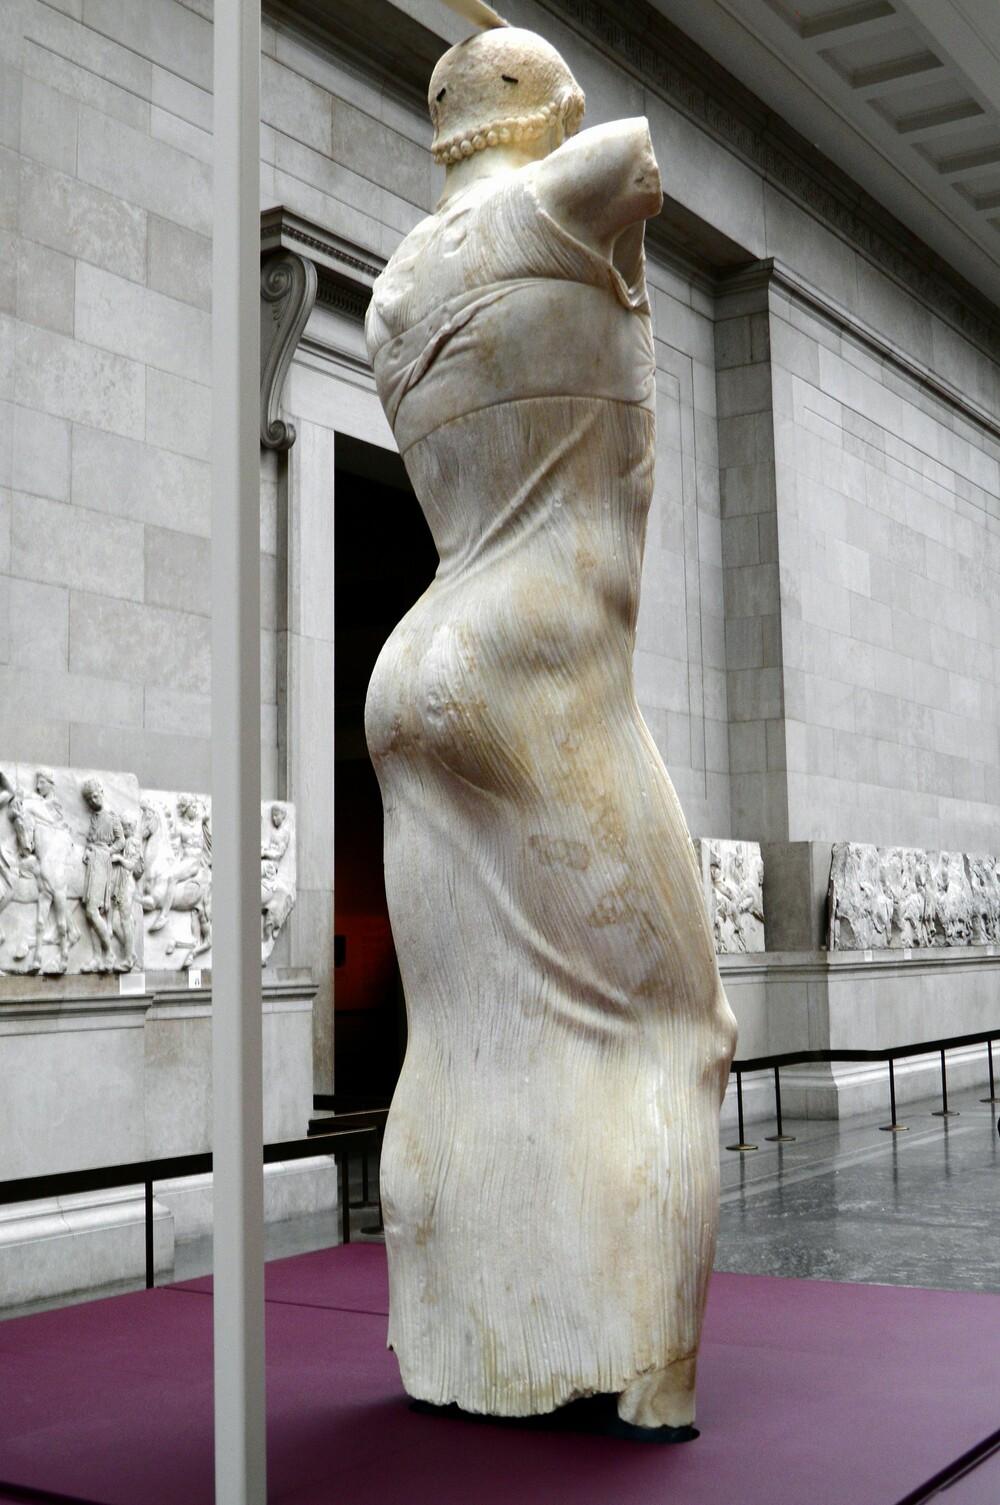 https://www.lifo.gr/sites/default/files/styles/free_height_medium/public/articles/2020-11-05/06.the_motya_charioteer.jpg?itok=evokX7m-